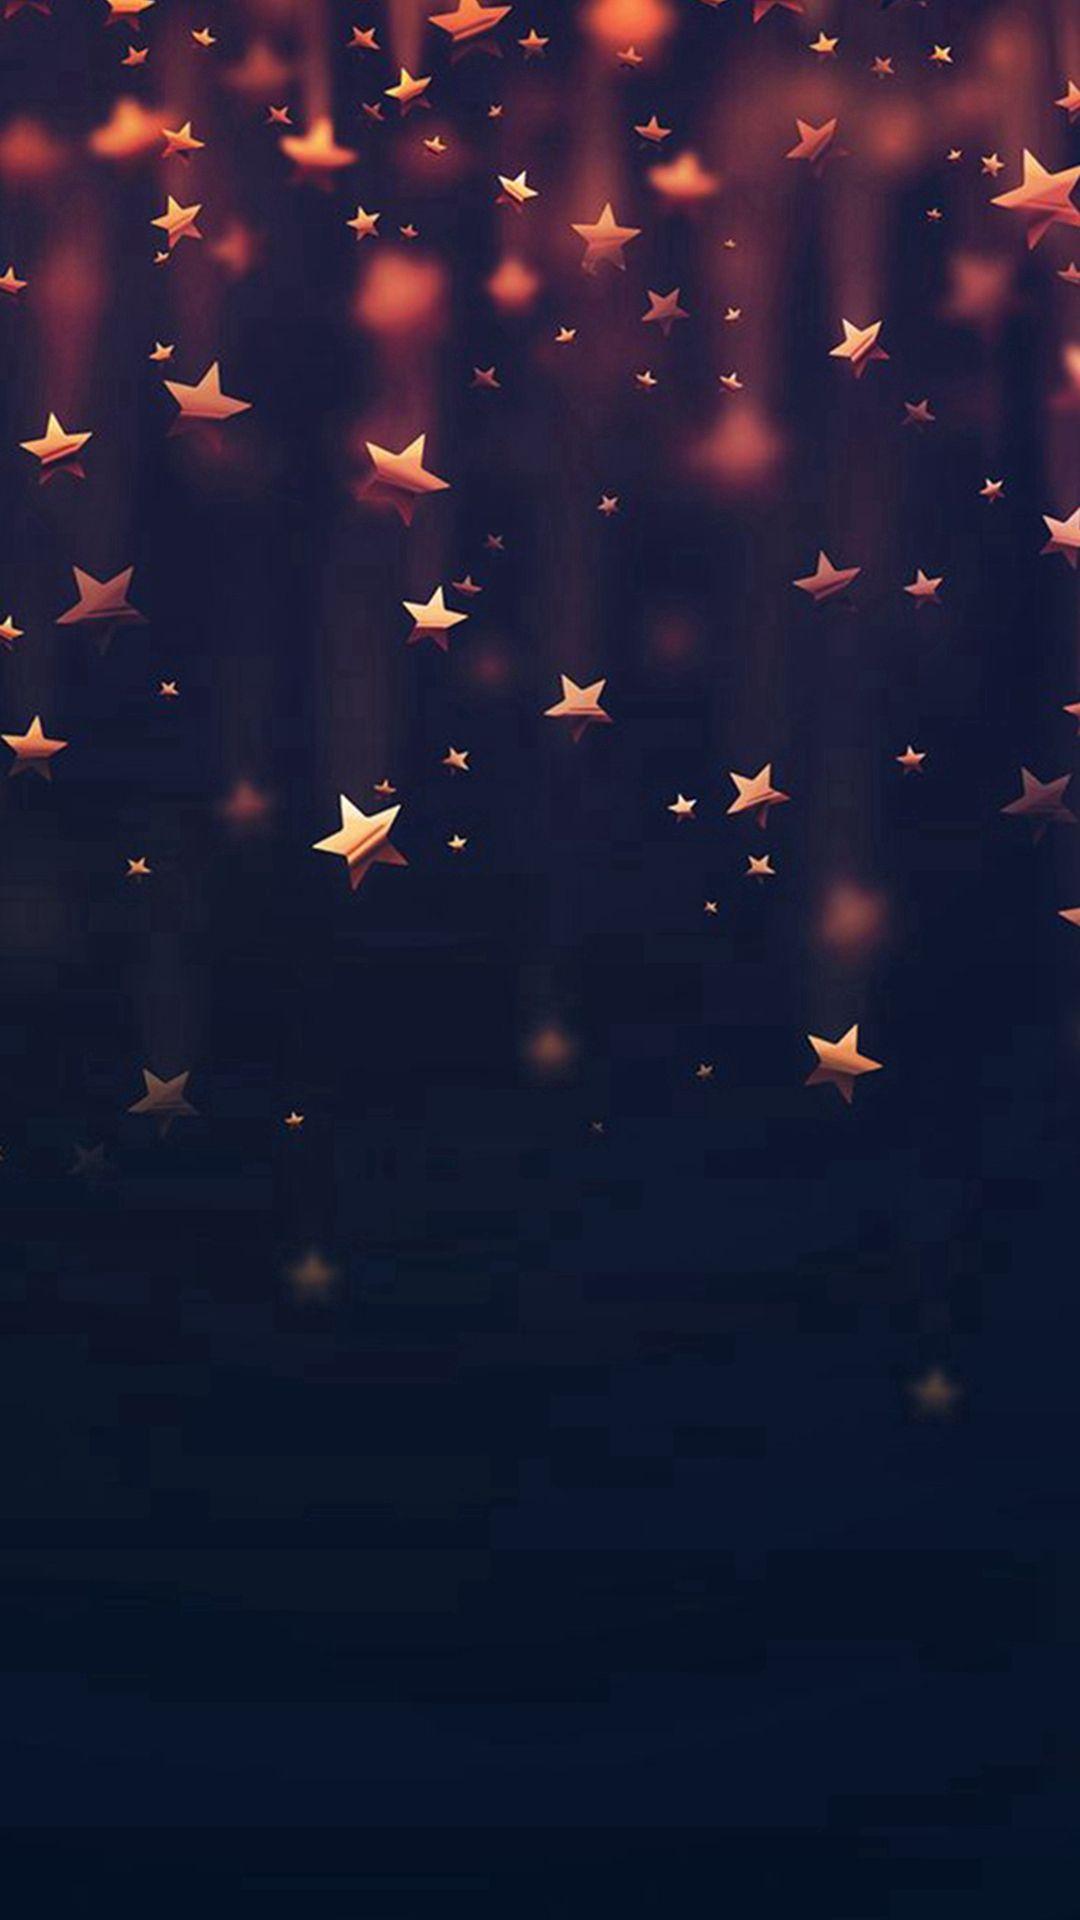 Golden Falling Stars iPhone 6 wallpaper iPhone 68 Wallpapers 1080x1920